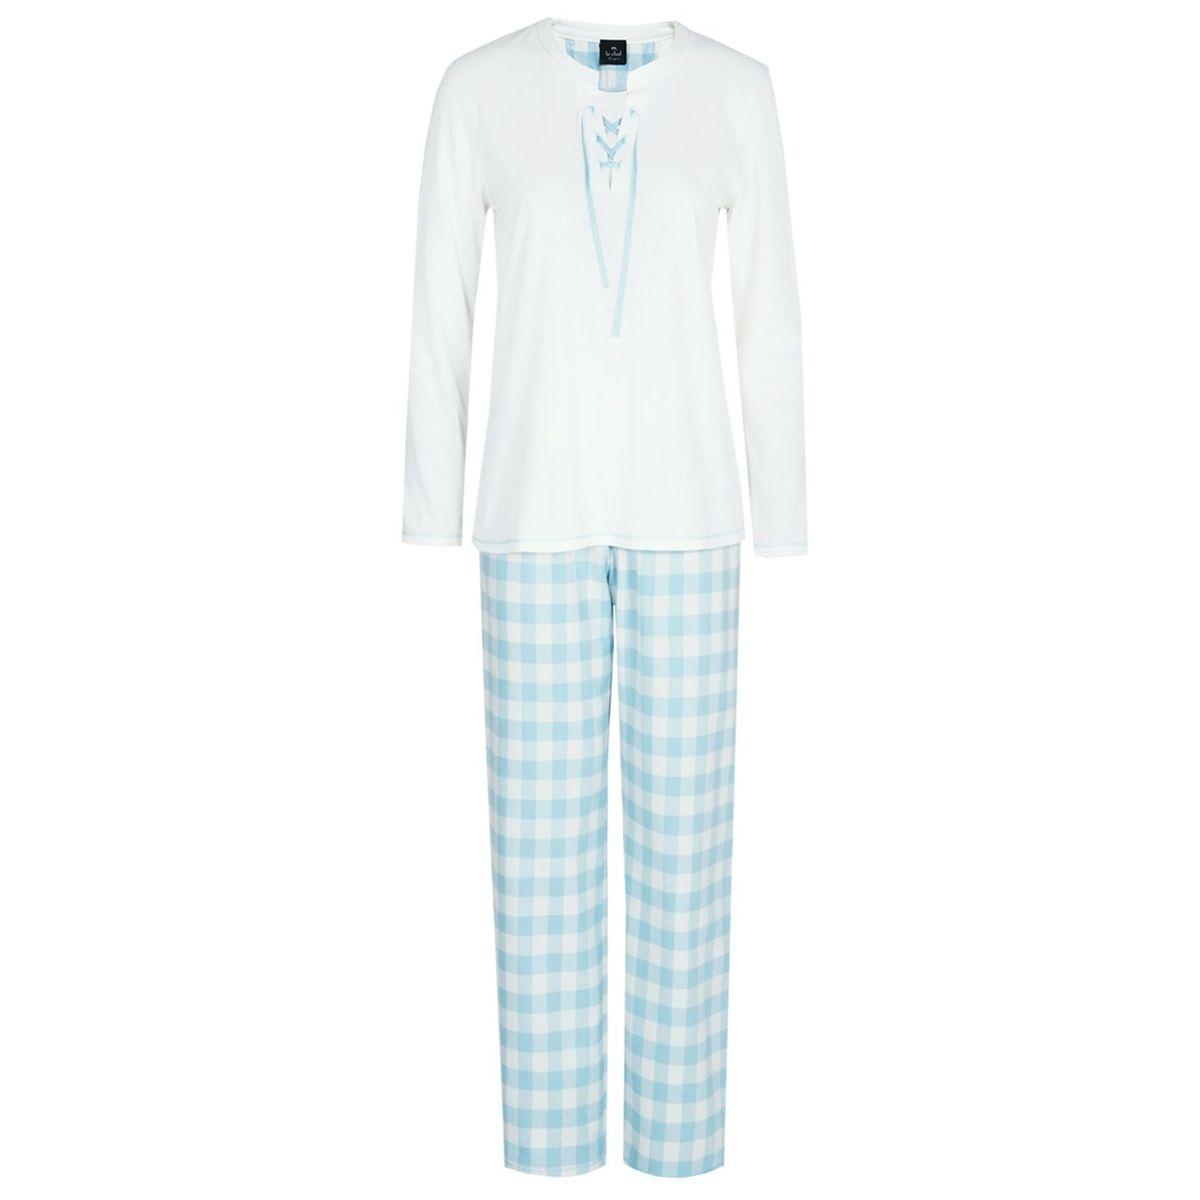 Pyjama en coton LOUISON 302